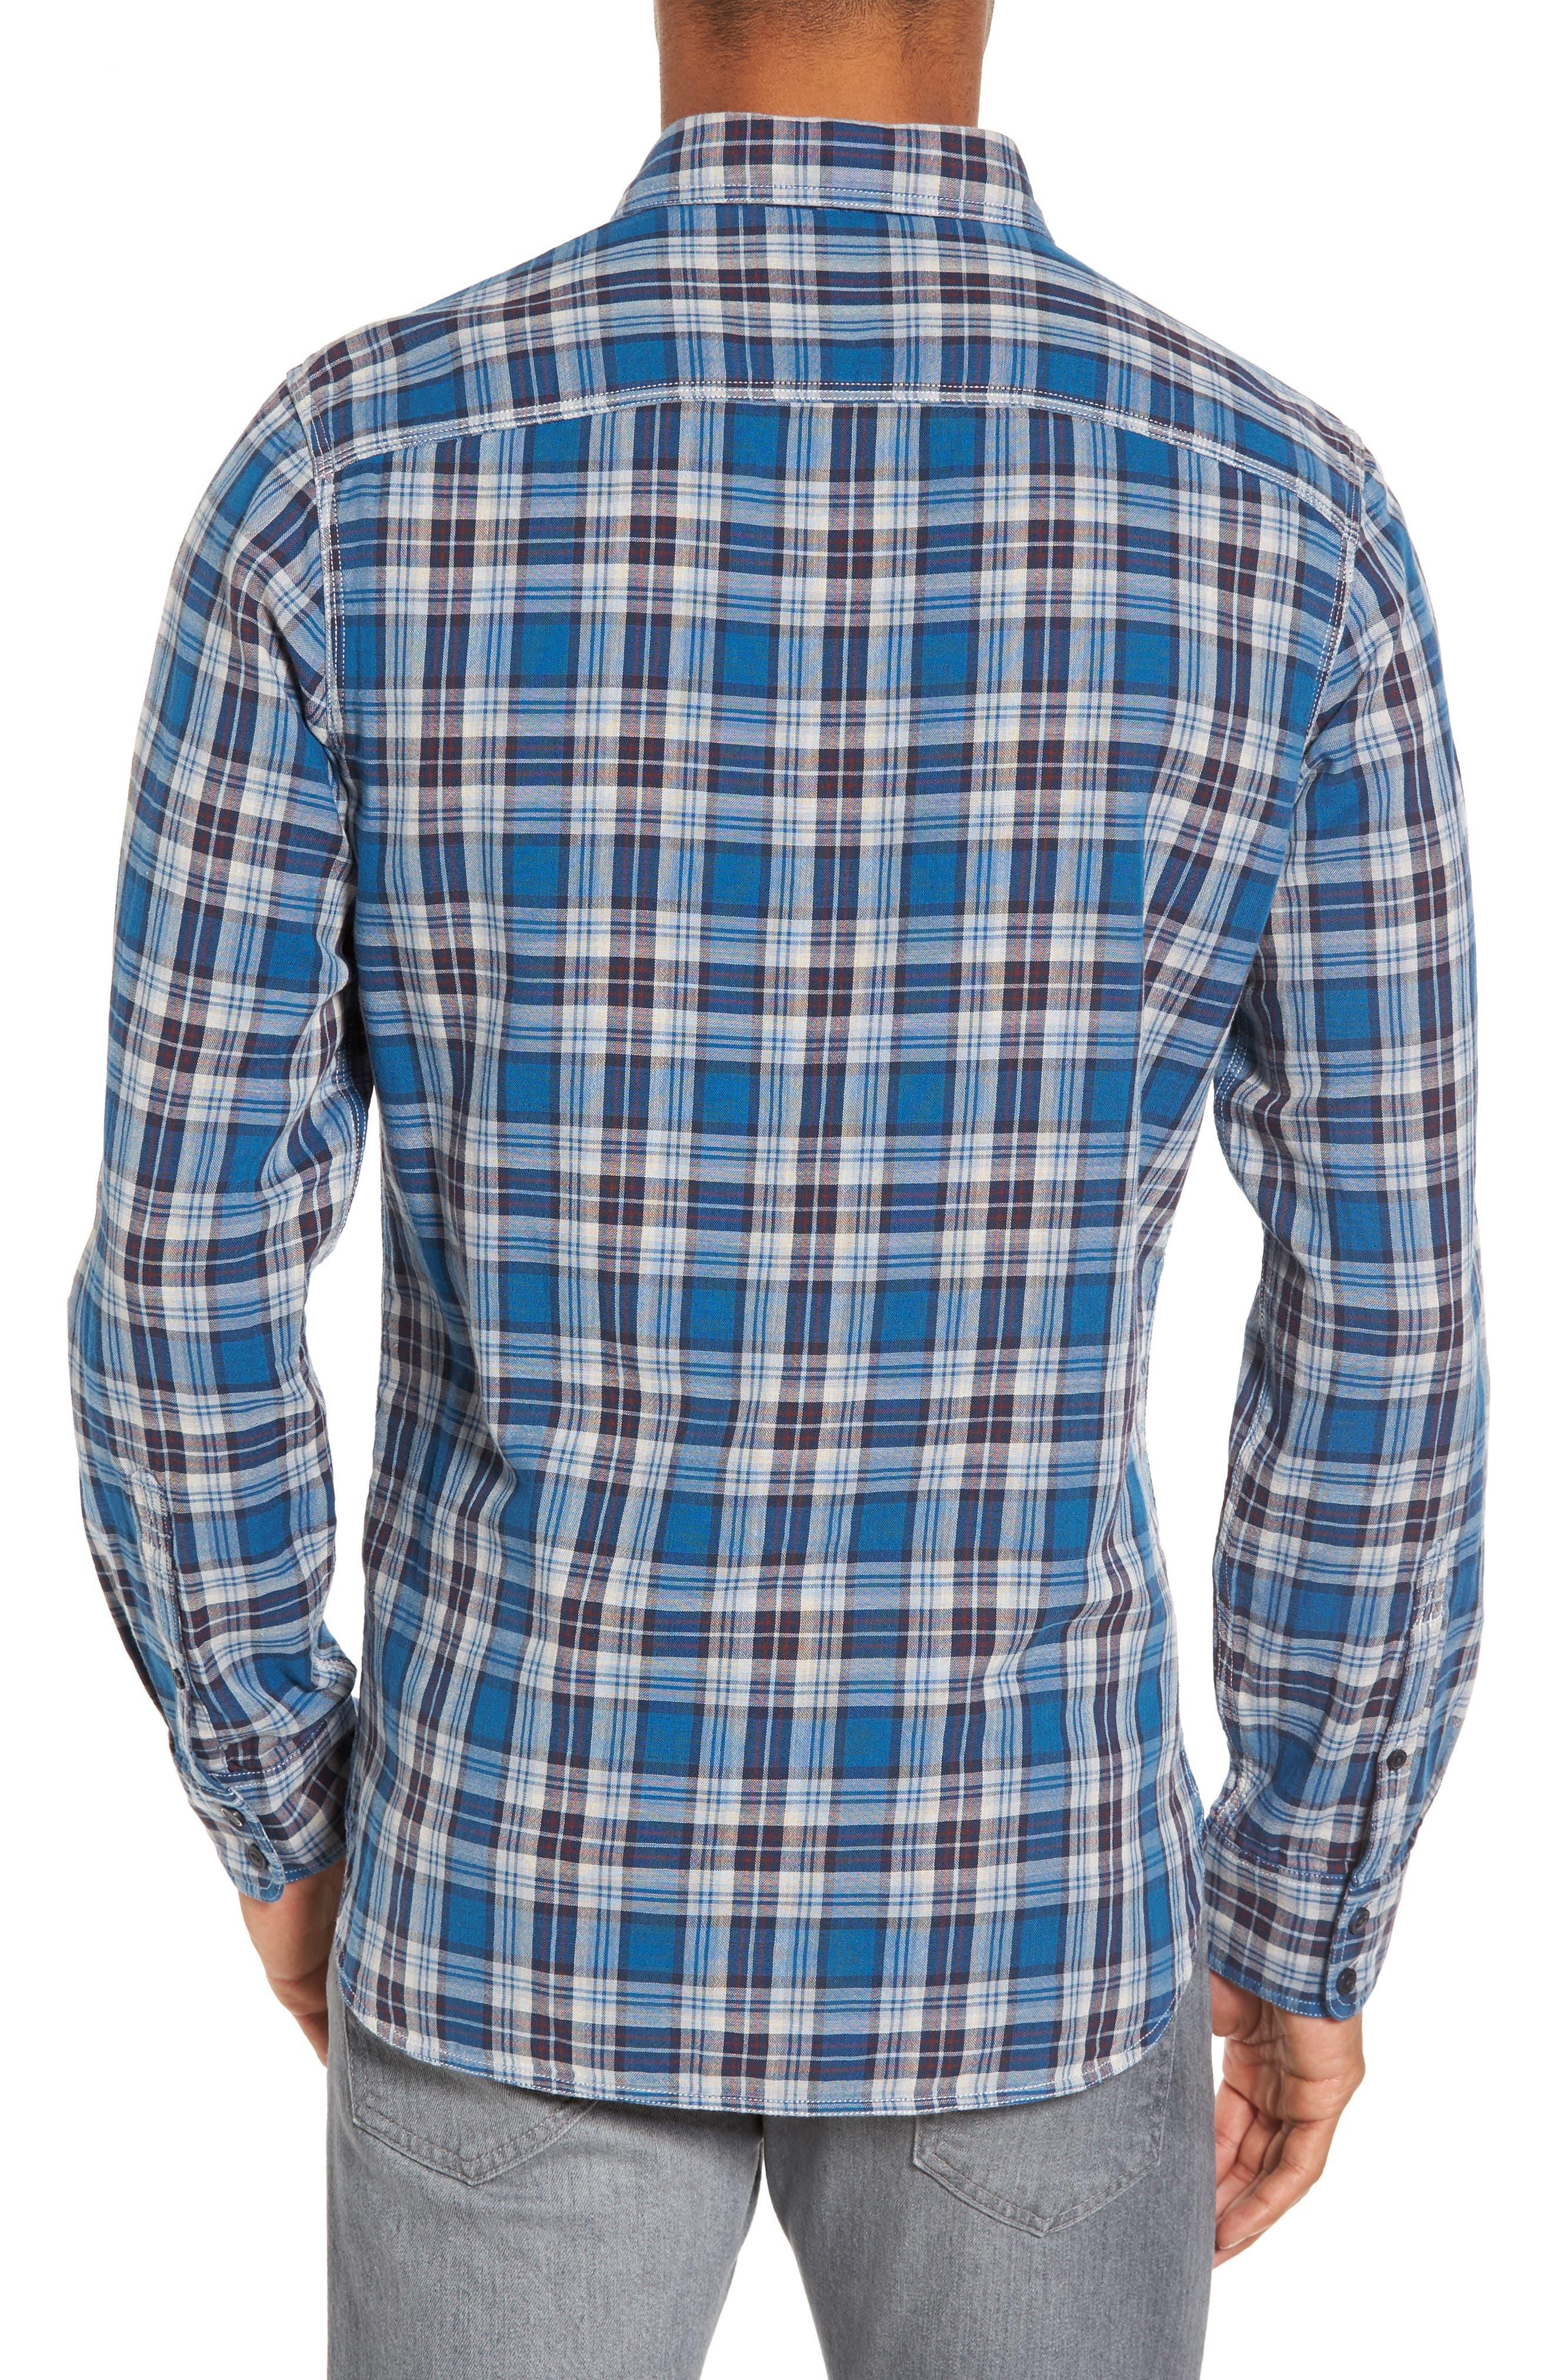 Alternate Image 2  - Nordstrom Men's Shop Workwear Duofold Plaid Sport Shirt